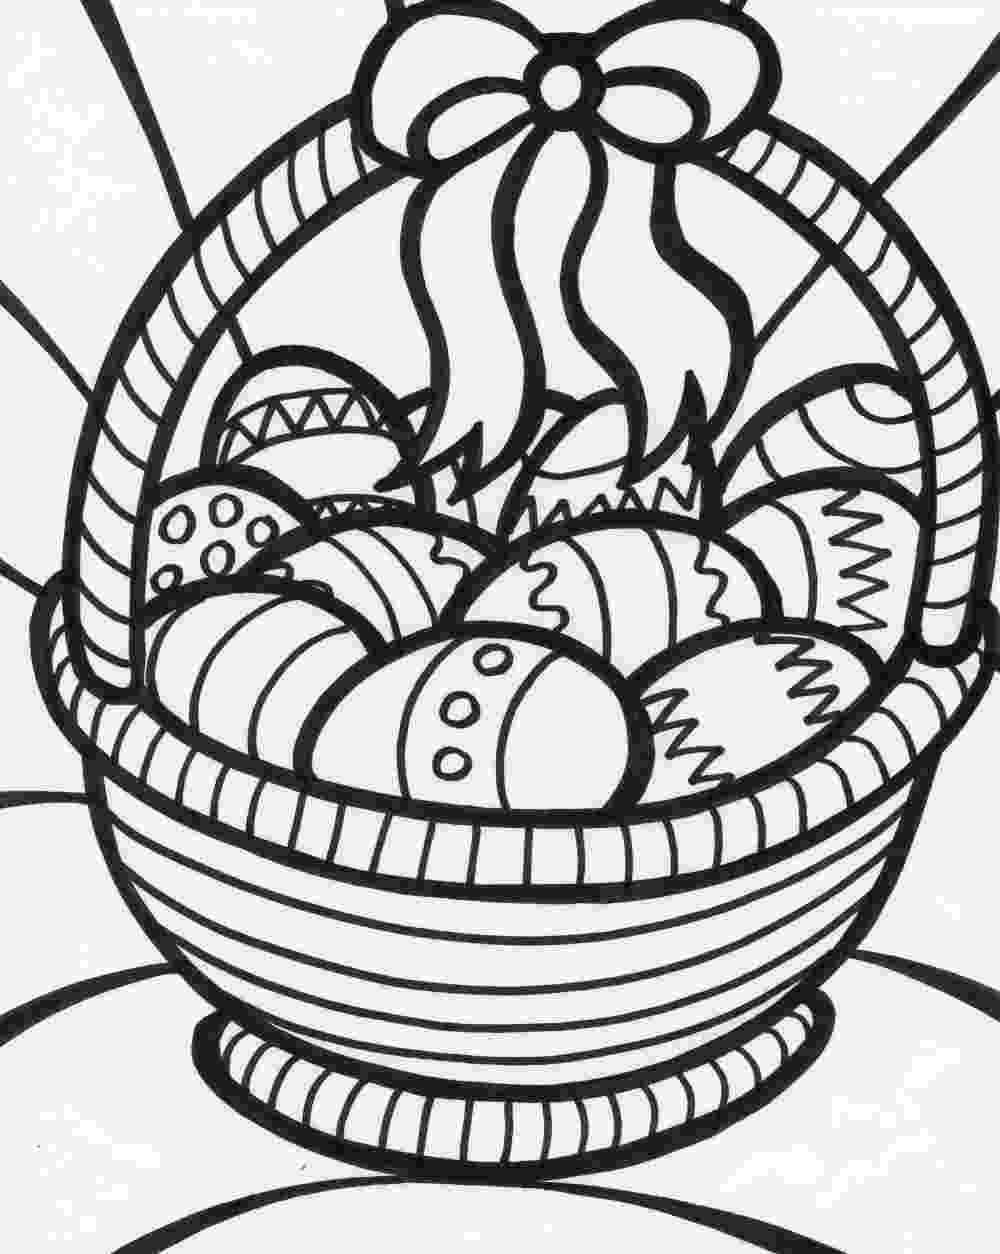 easter basket colouring easter online coloring pages page 1 basket easter colouring